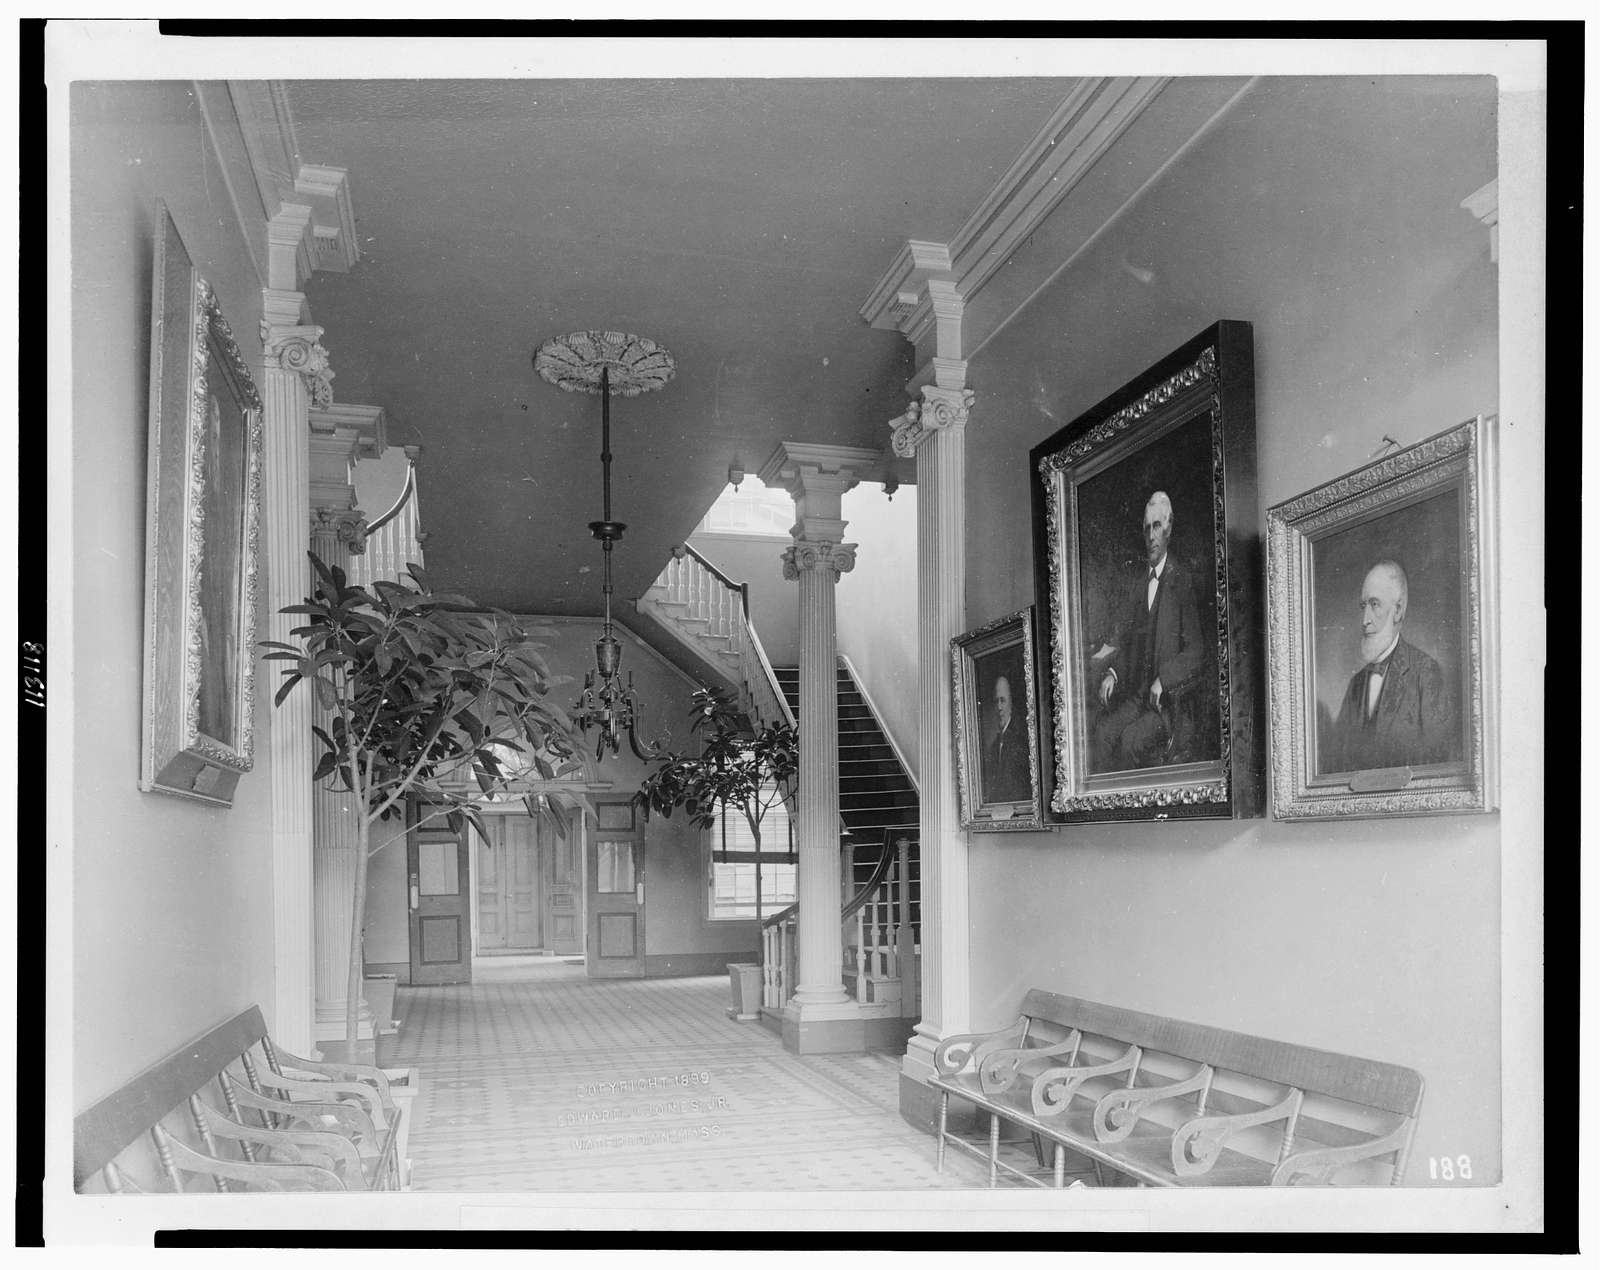 [Hallway in Pennsylvania Hospital, Philadelphia]